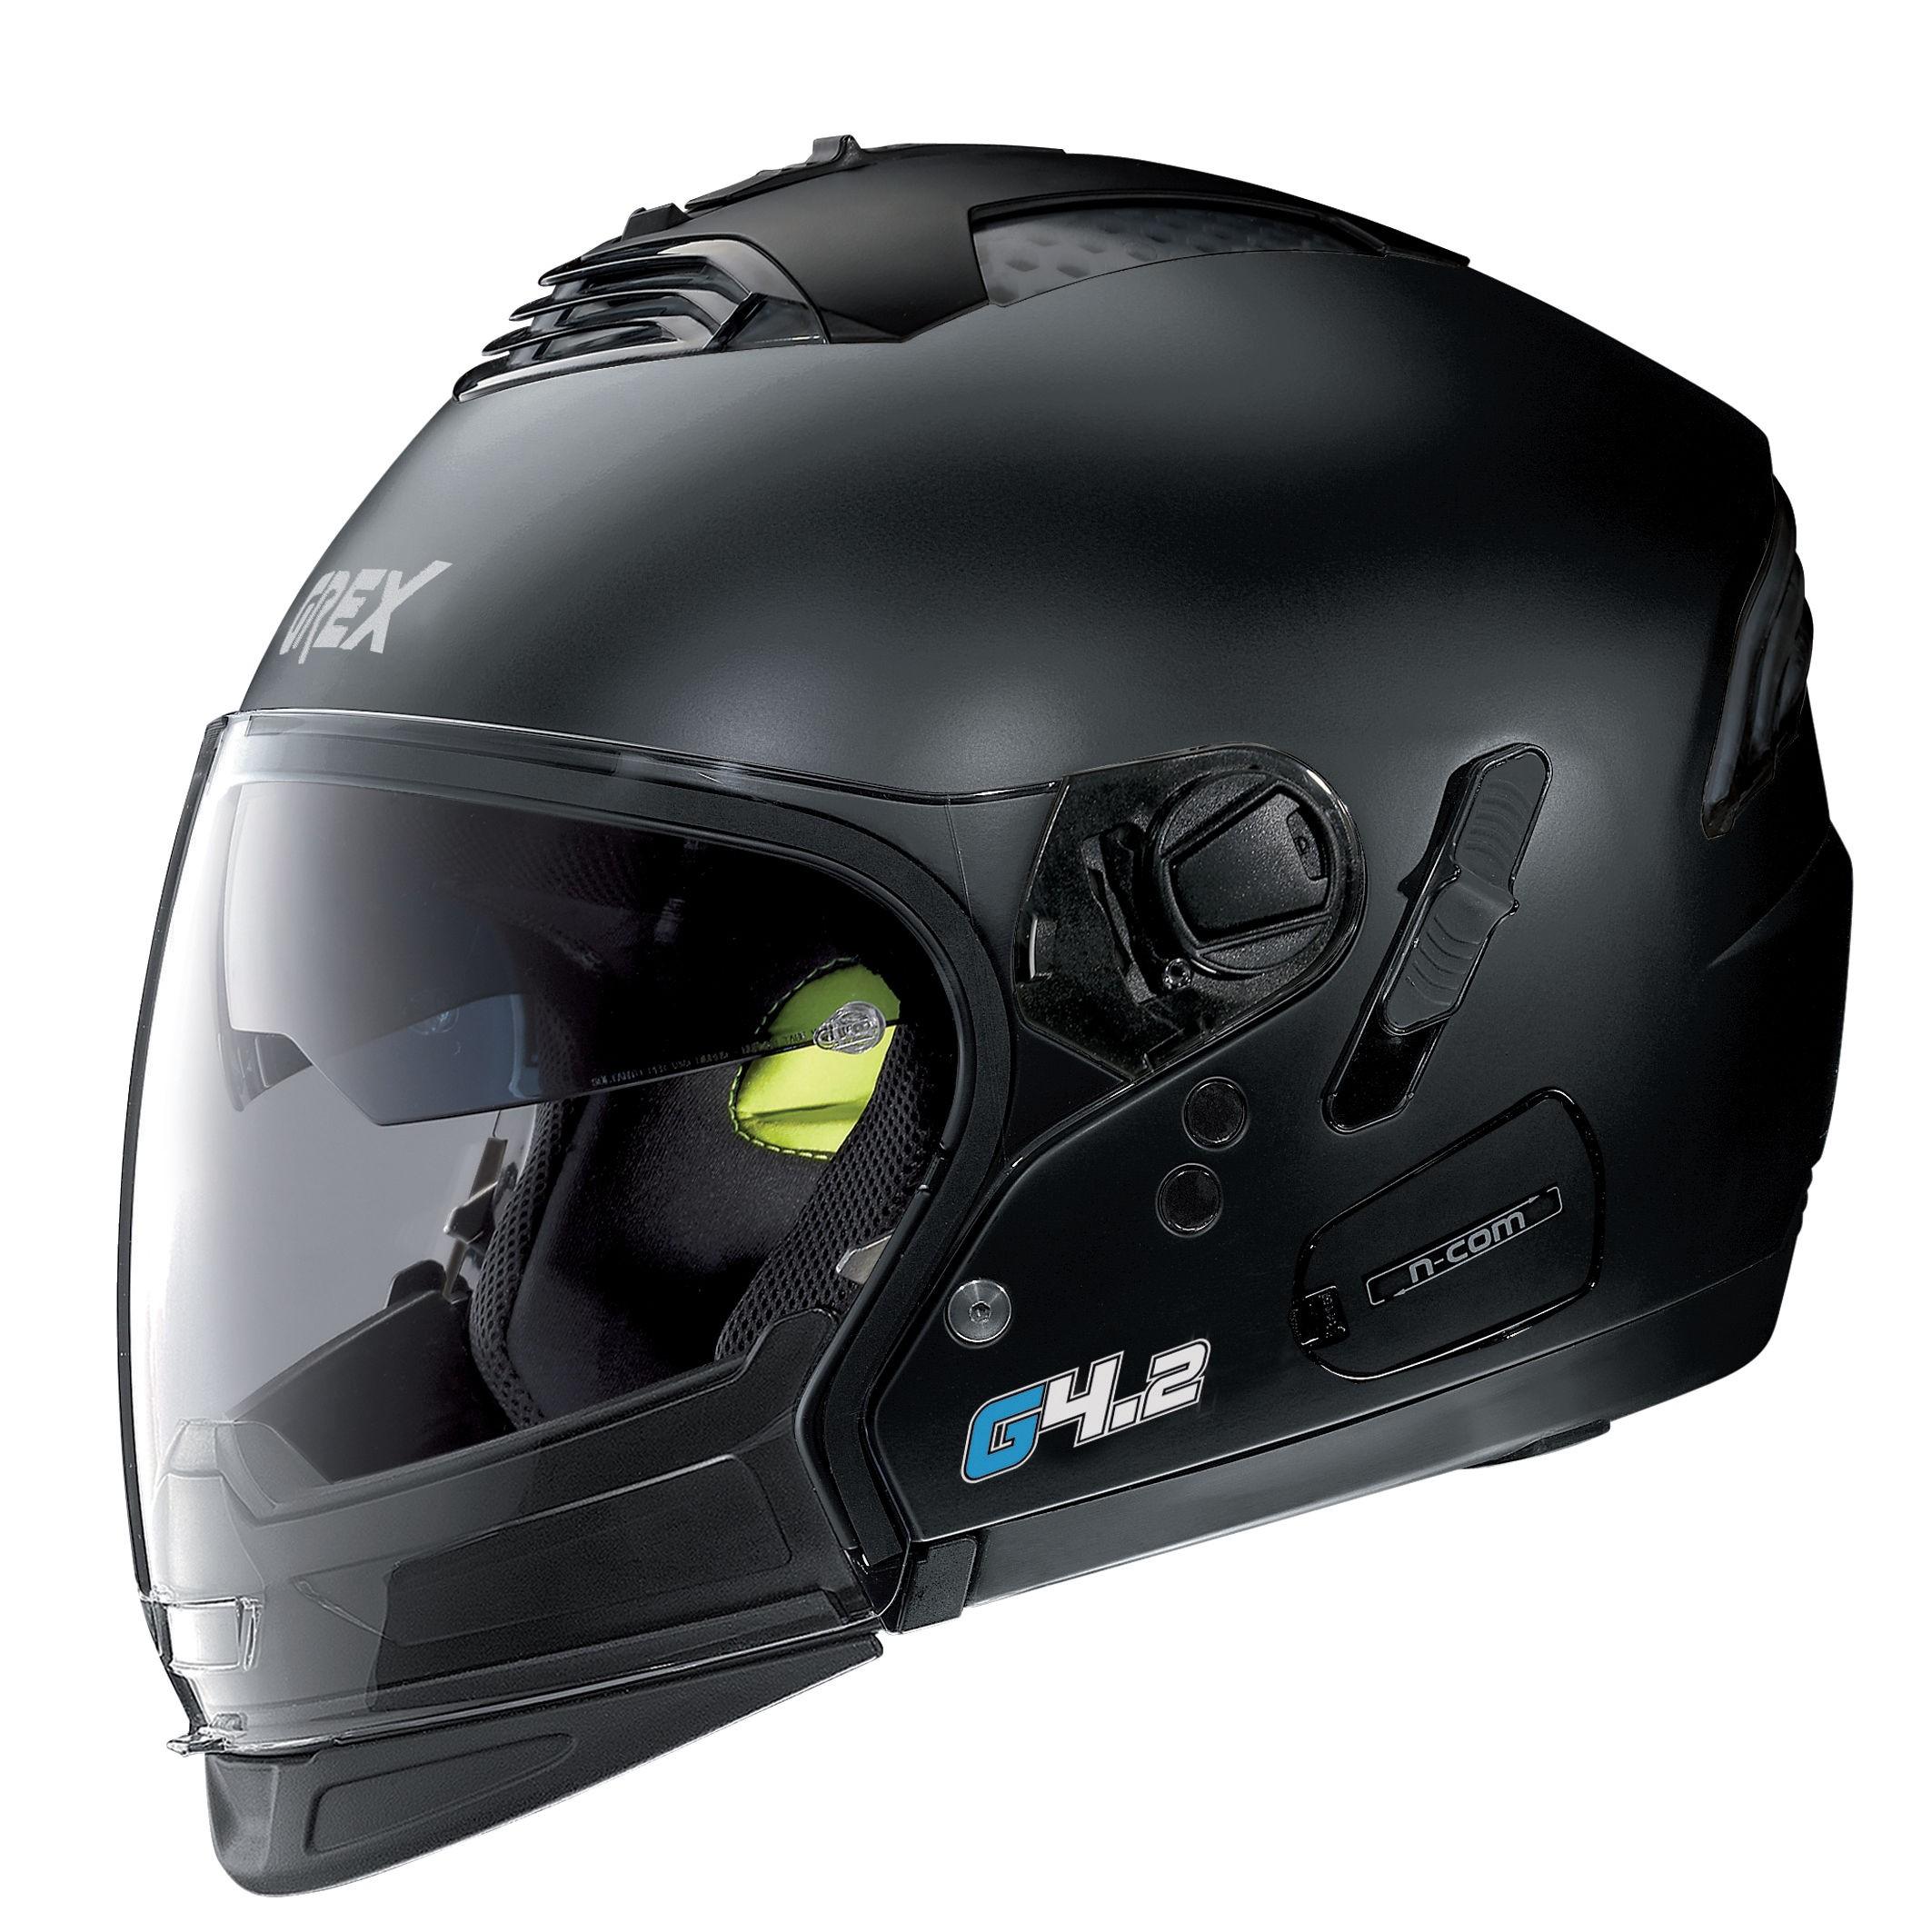 Moto helma Grex G4.2 PRO Kinetic N-Com Flat Black 2